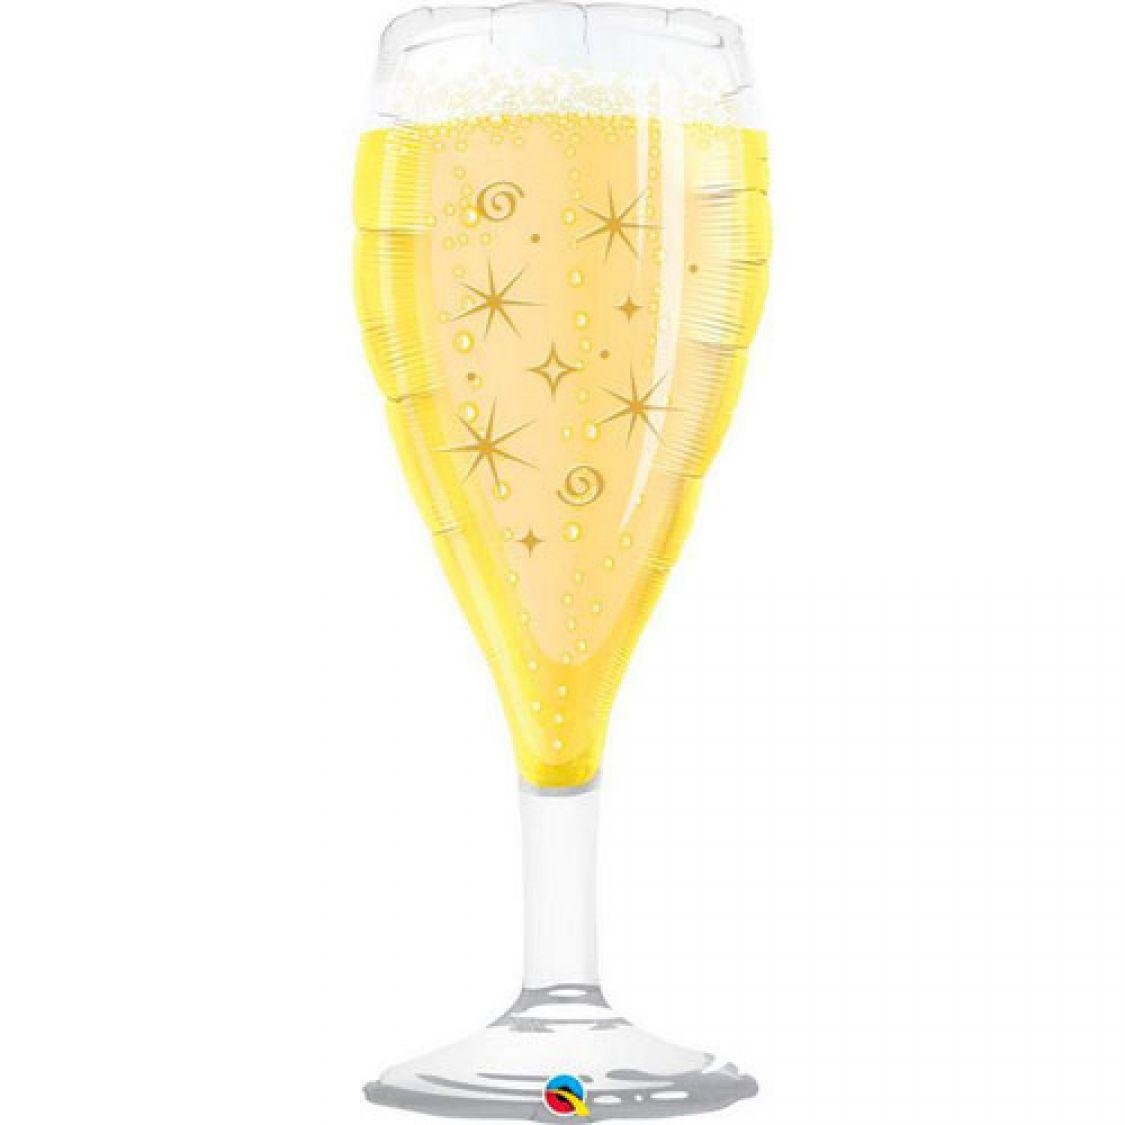 ballon flute de champagne. Black Bedroom Furniture Sets. Home Design Ideas